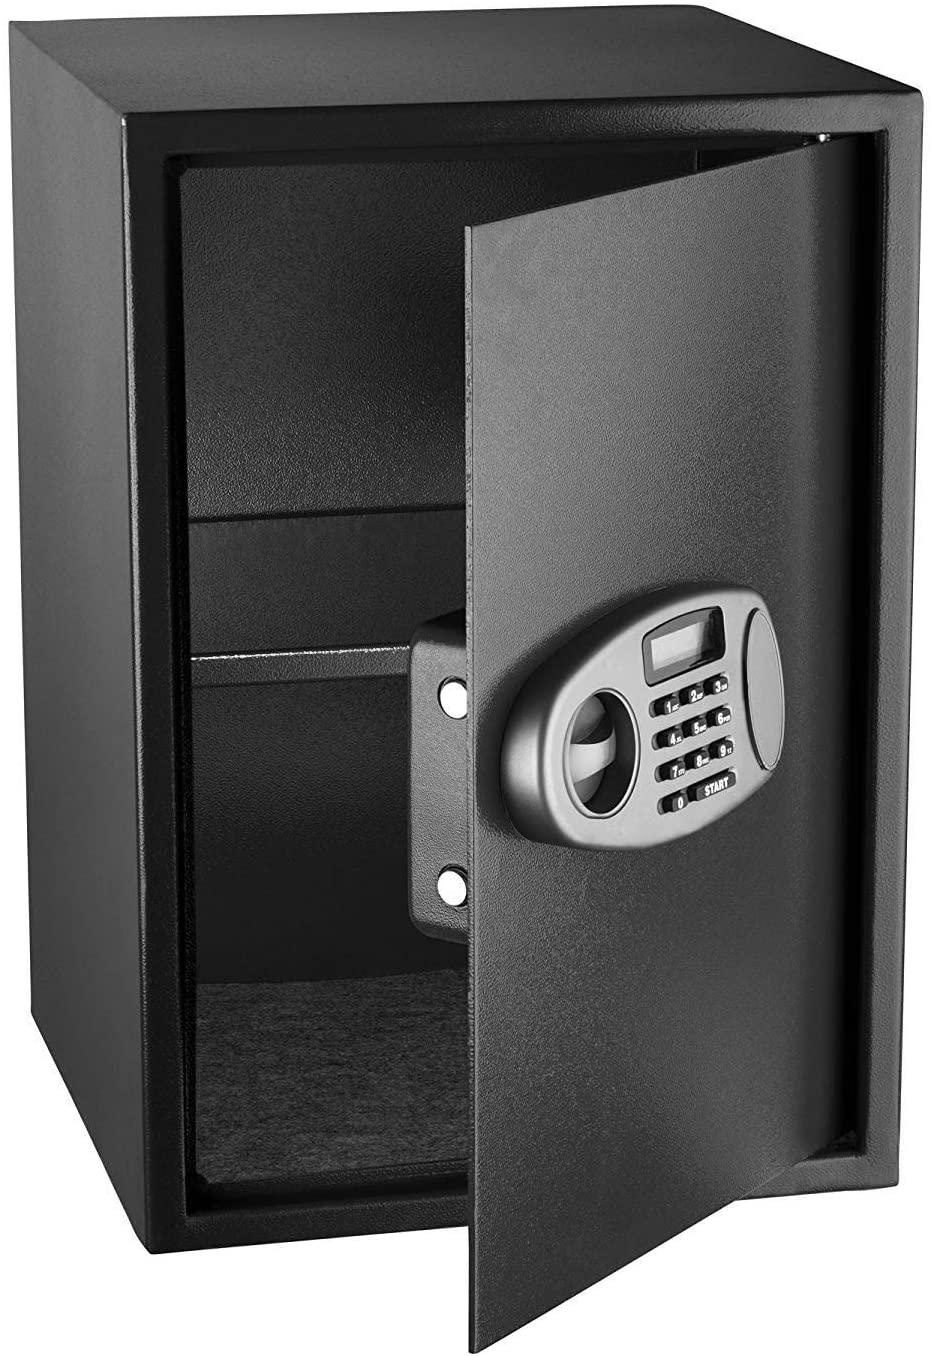 AdirOffice Security Safe with Digital Lock, Black, 2.32 Cubic Feet